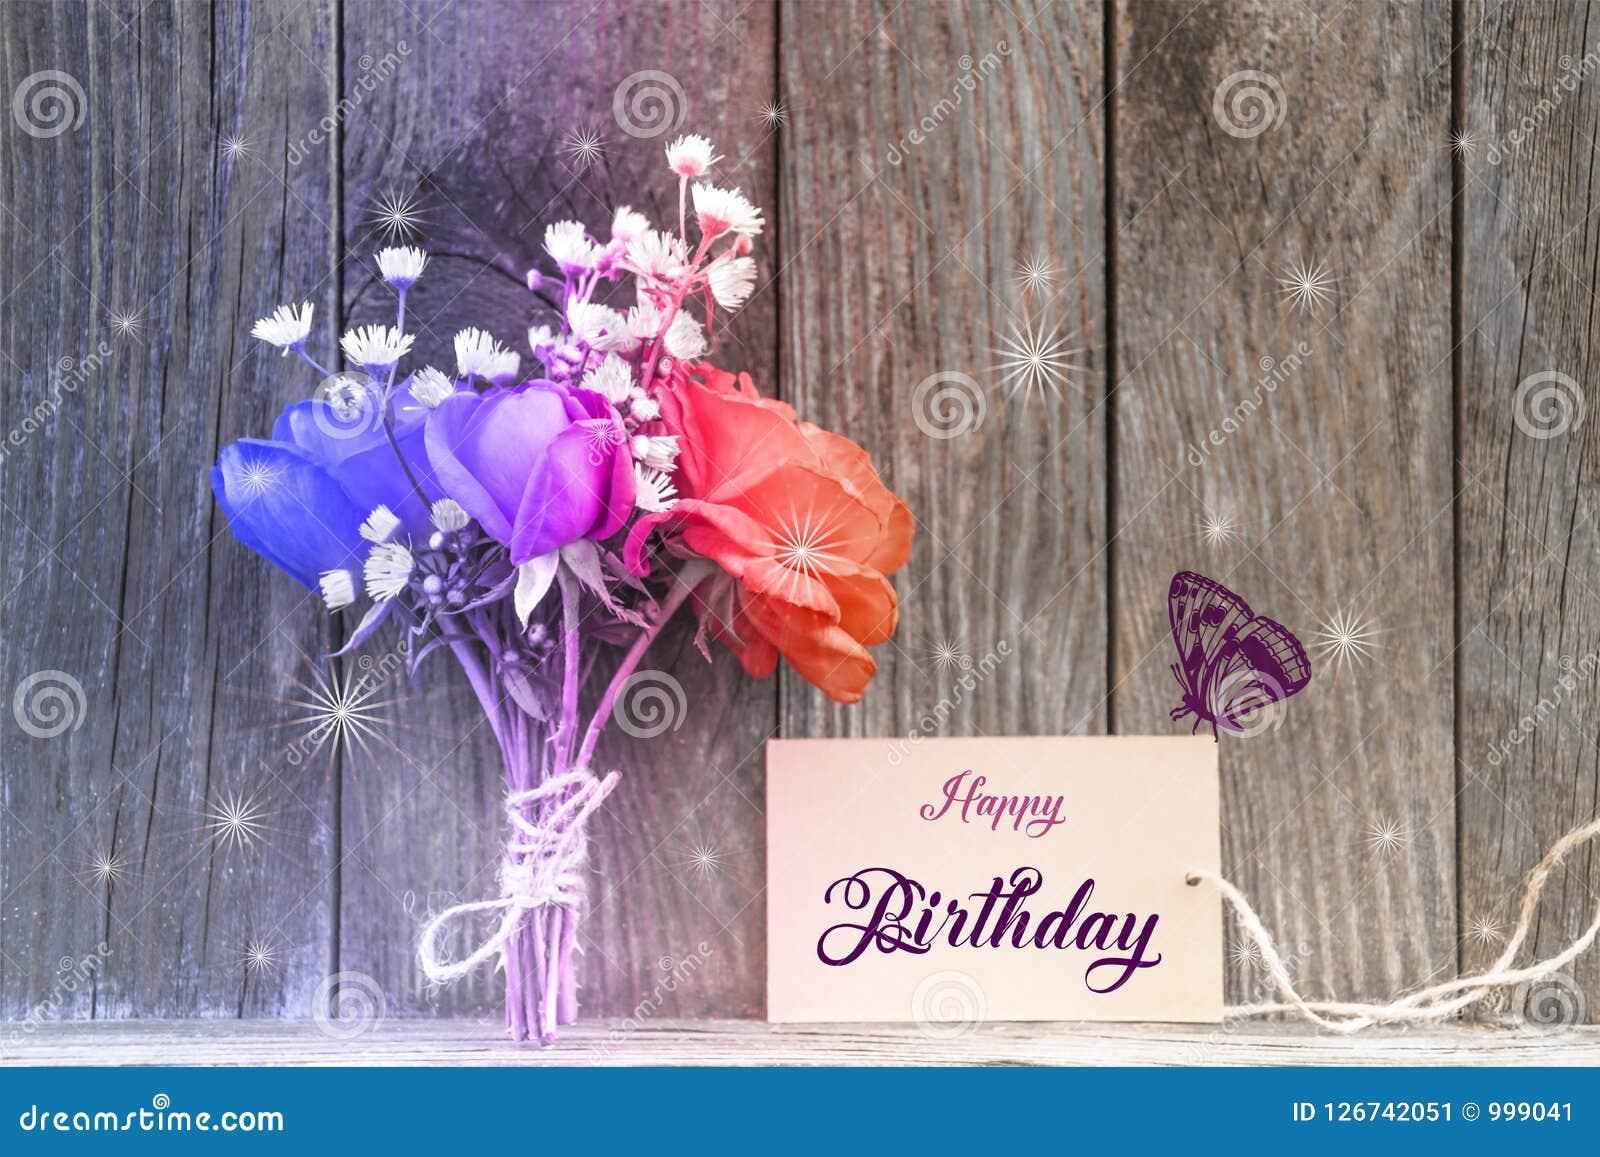 Happy Birthday Card Stock Image Image Of Background 126742051